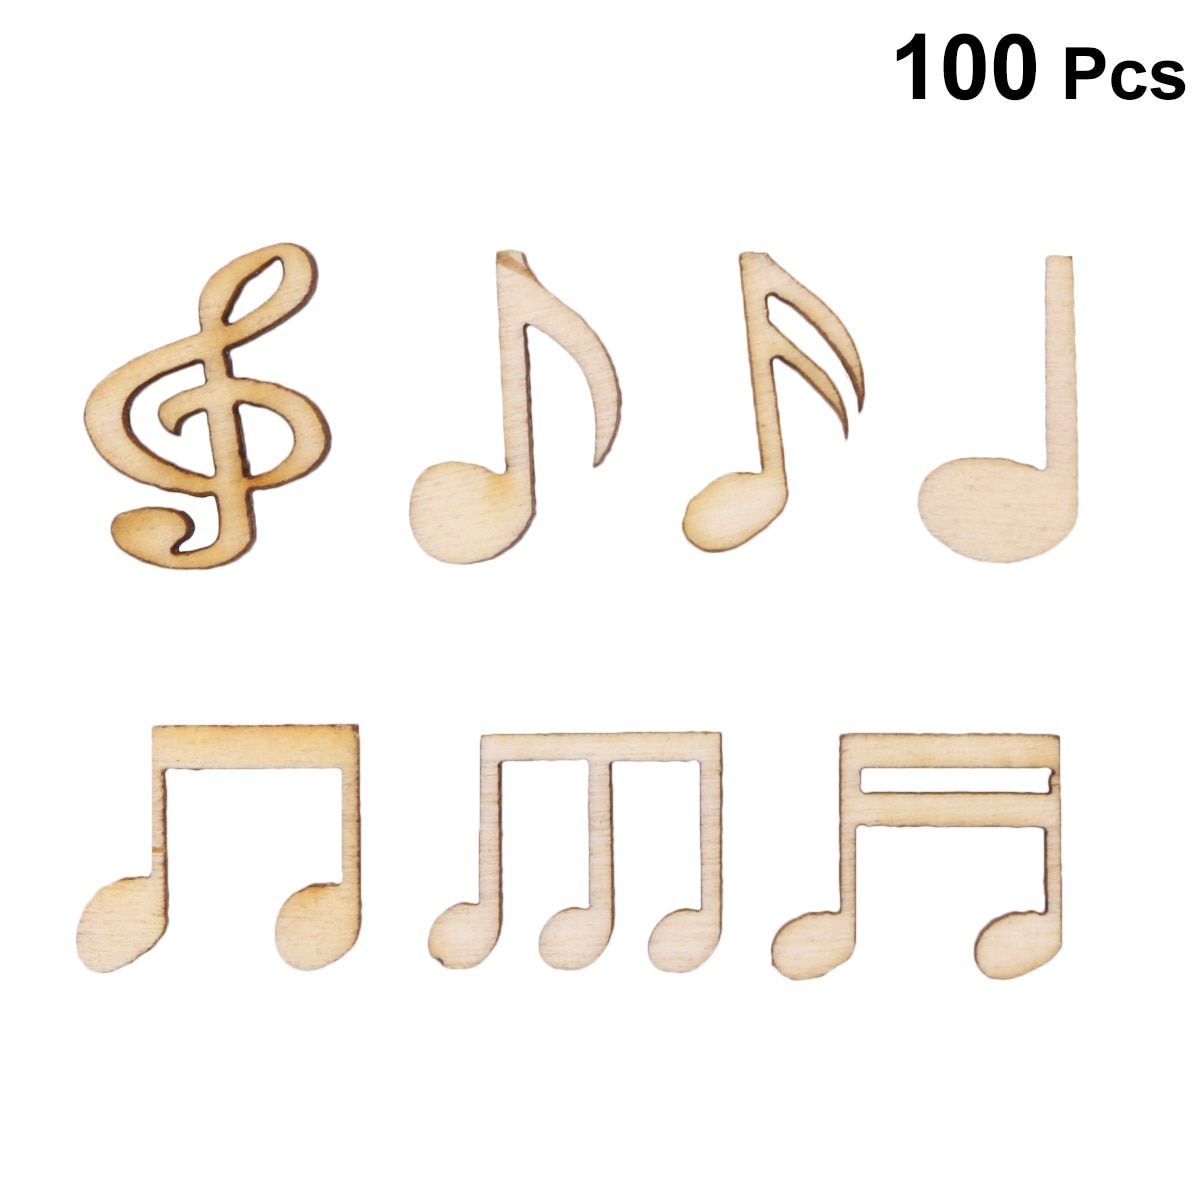 100PCS DIY Doodle Educational Toy Musical Notes Natural Wooden Slice Scrapbooking Embellishments DIY Craft Decor (Burlywood)